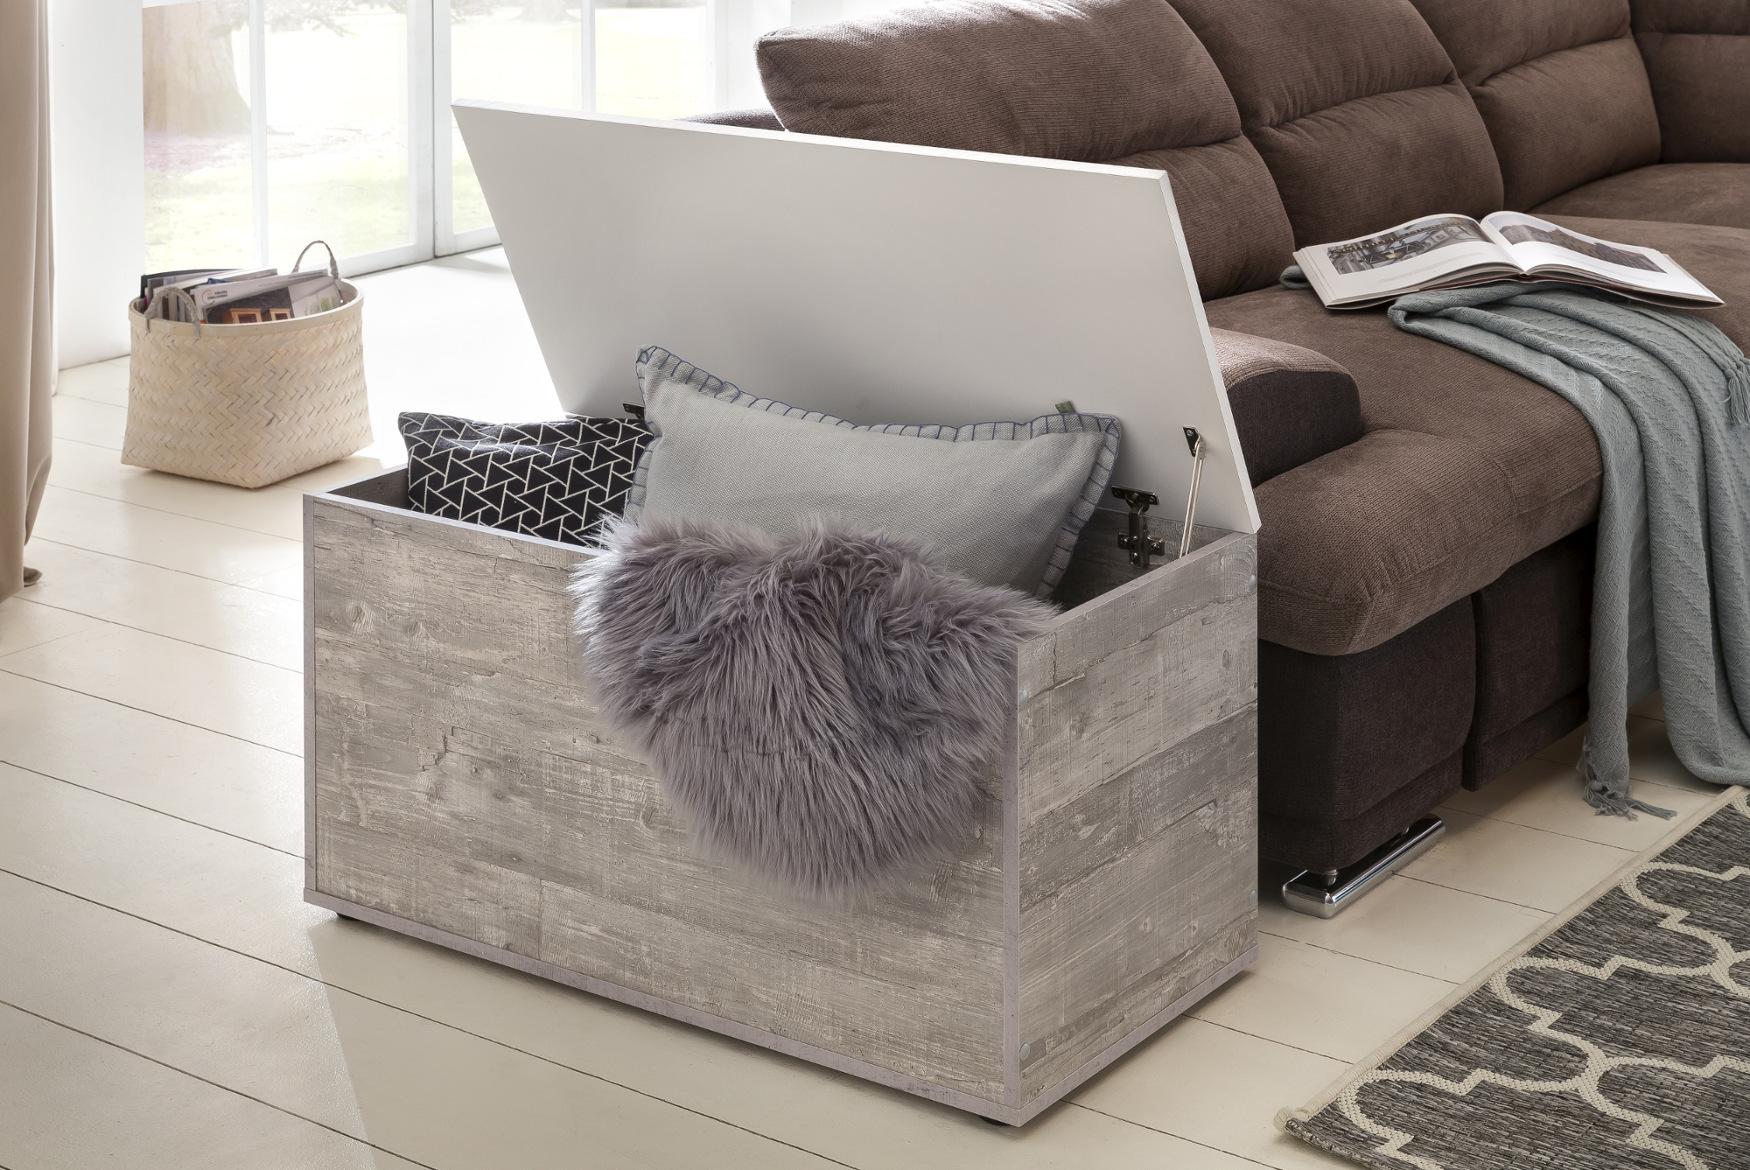 truhe maxi klappdeckel beton grau wohnen diele. Black Bedroom Furniture Sets. Home Design Ideas